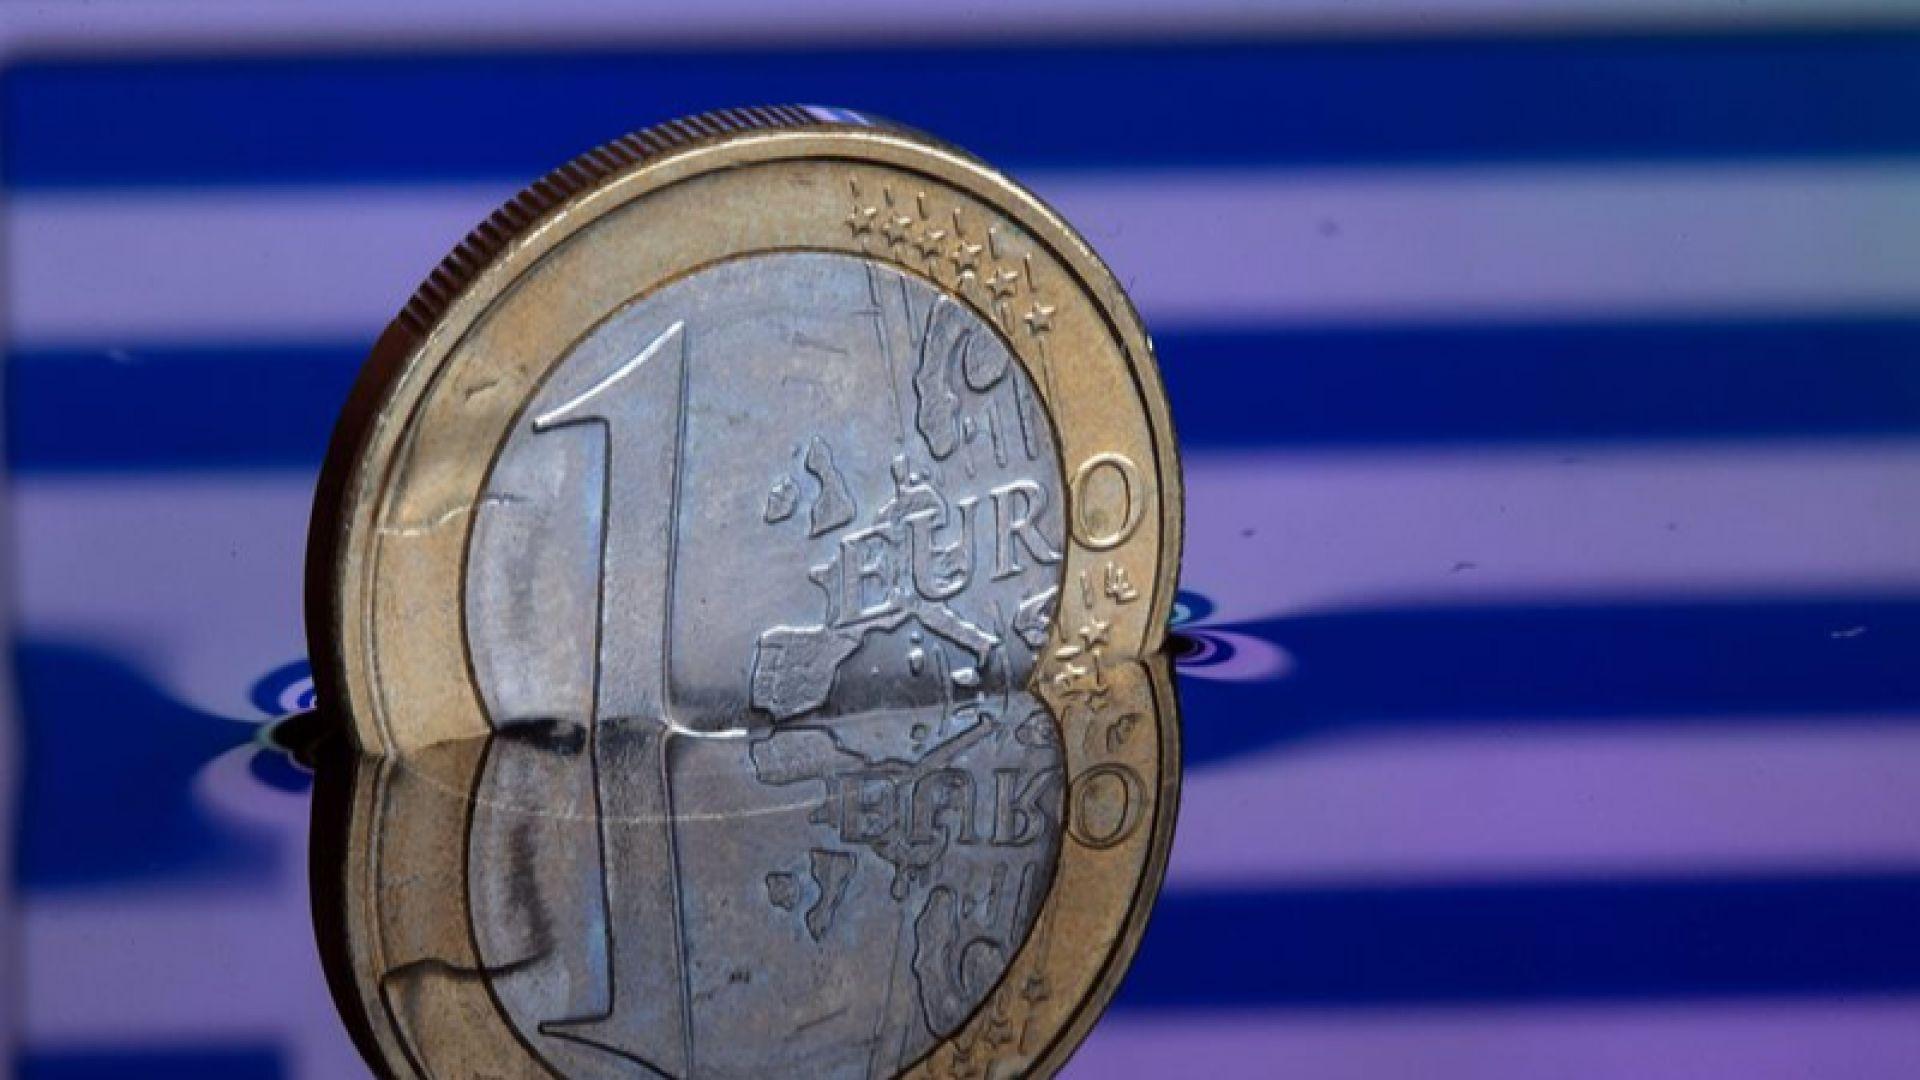 Доходността на гръцките ДЦК достигна ново рекордно ниско равнище